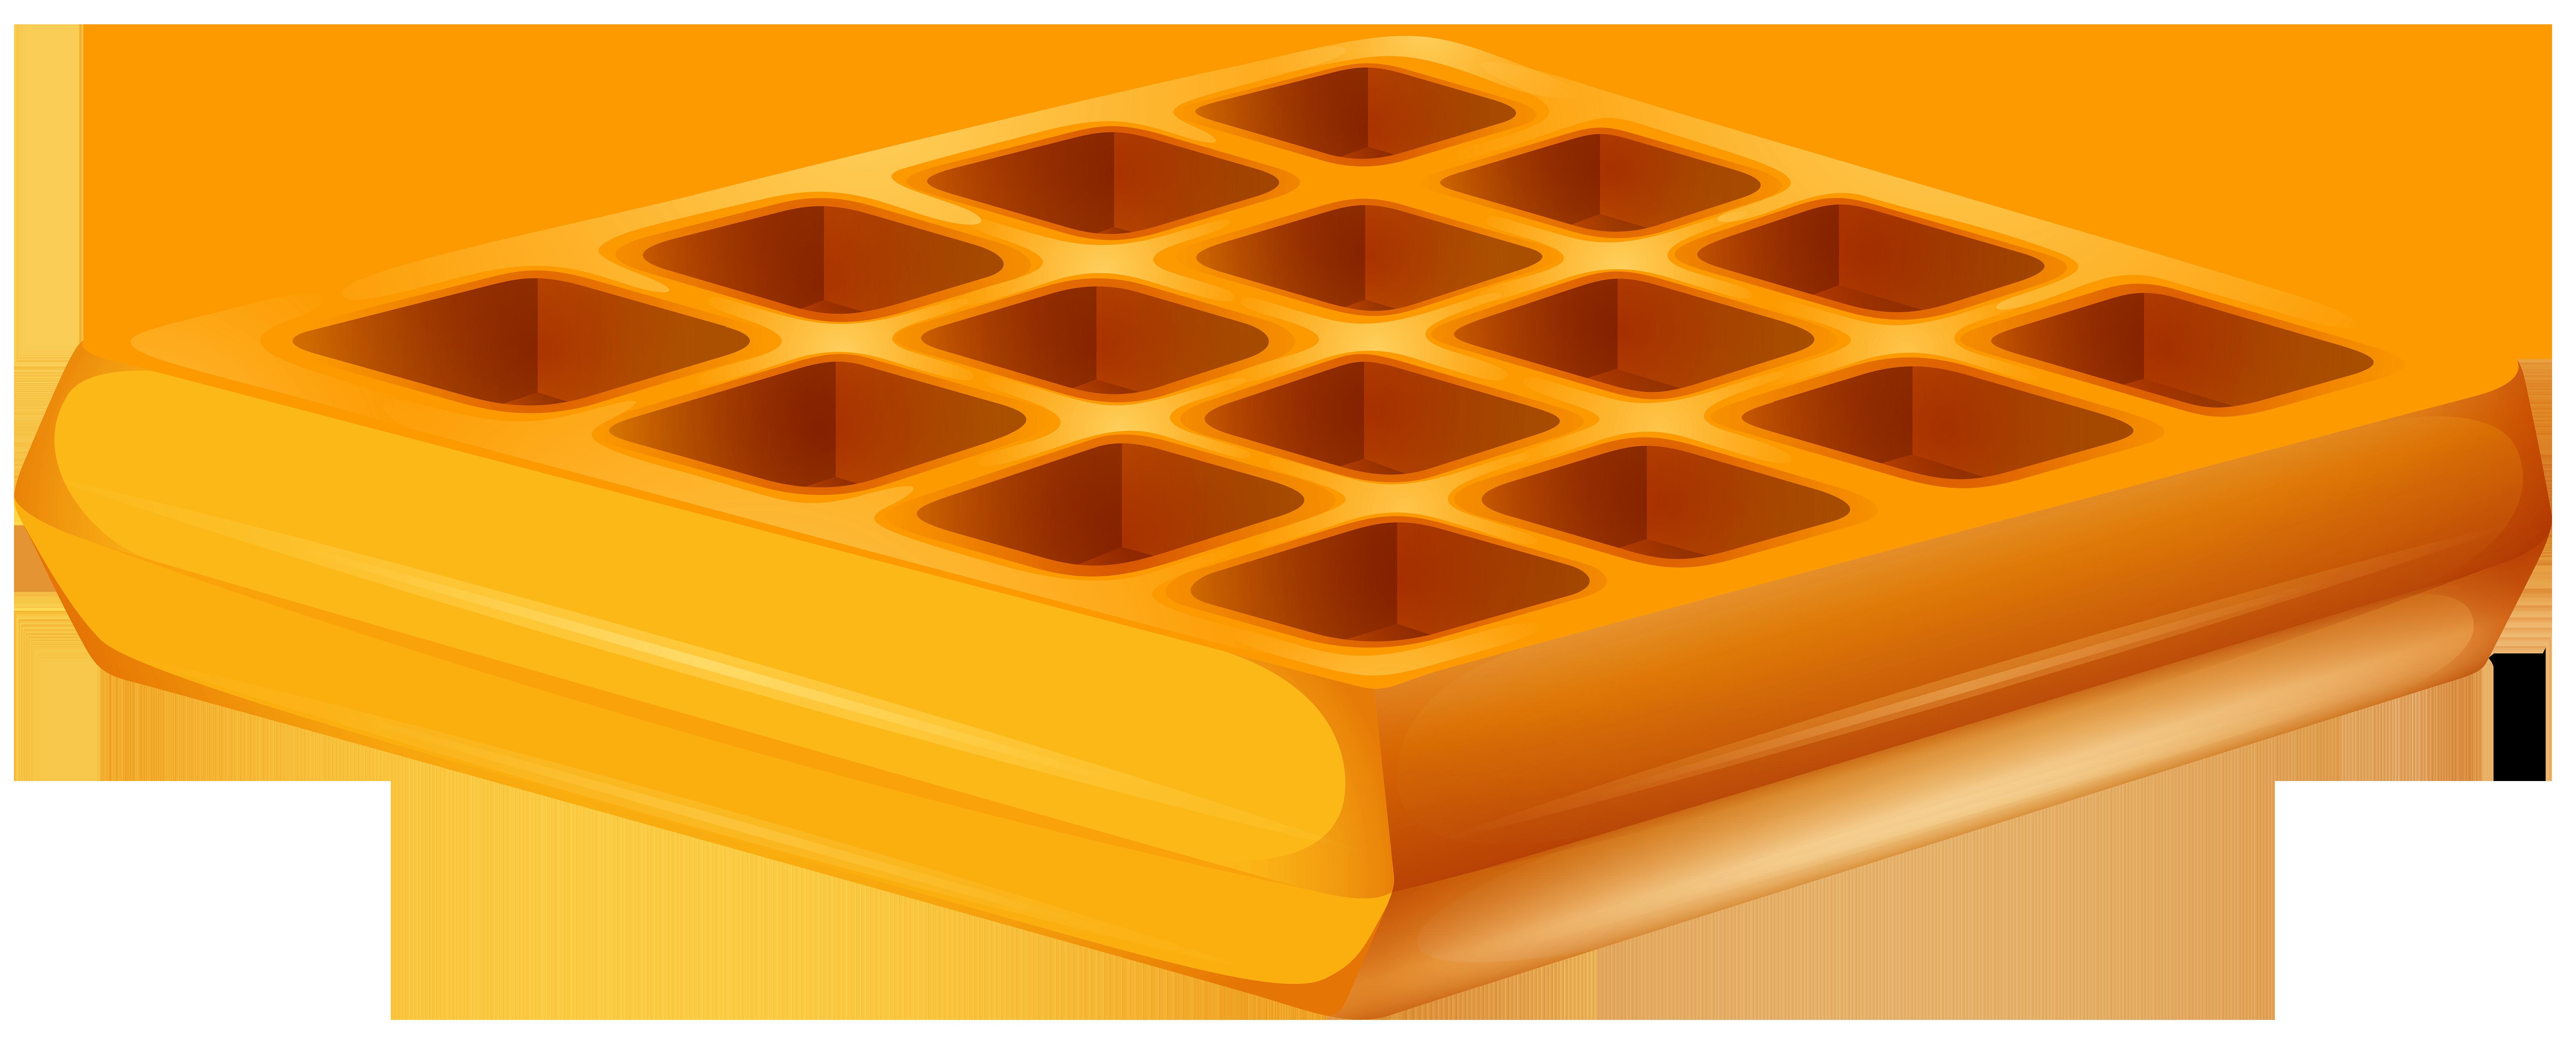 Waffle Transparent PNG Clip Art Image.